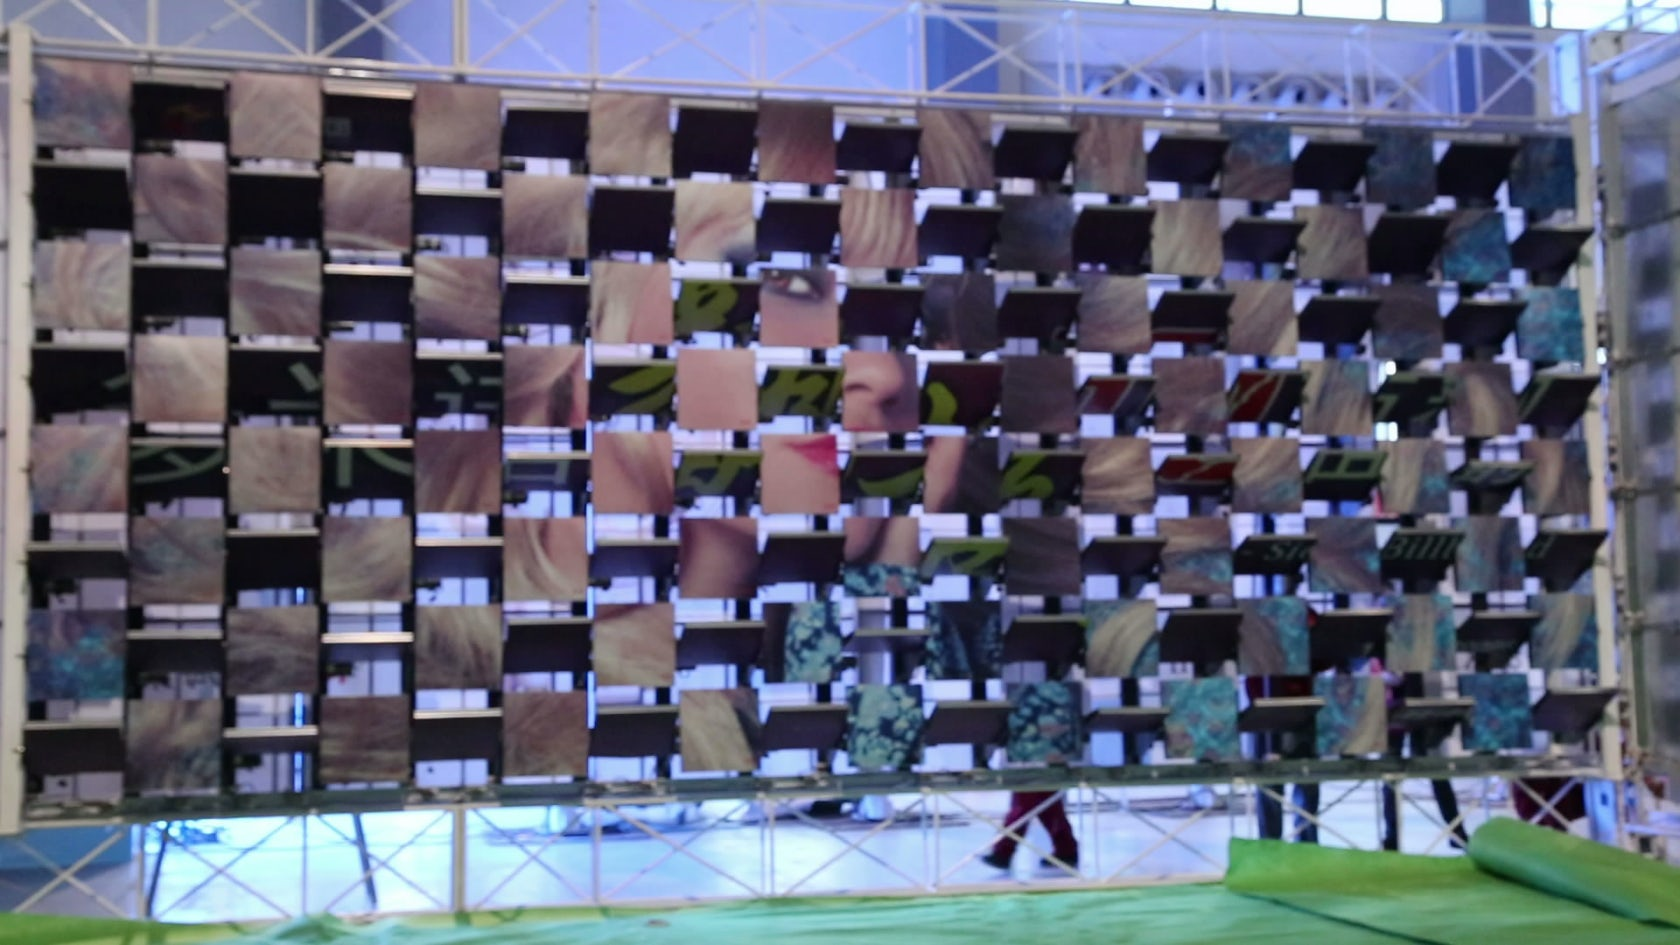 Building architectural design outdoor or indoor moving for Indoor garden design twitter